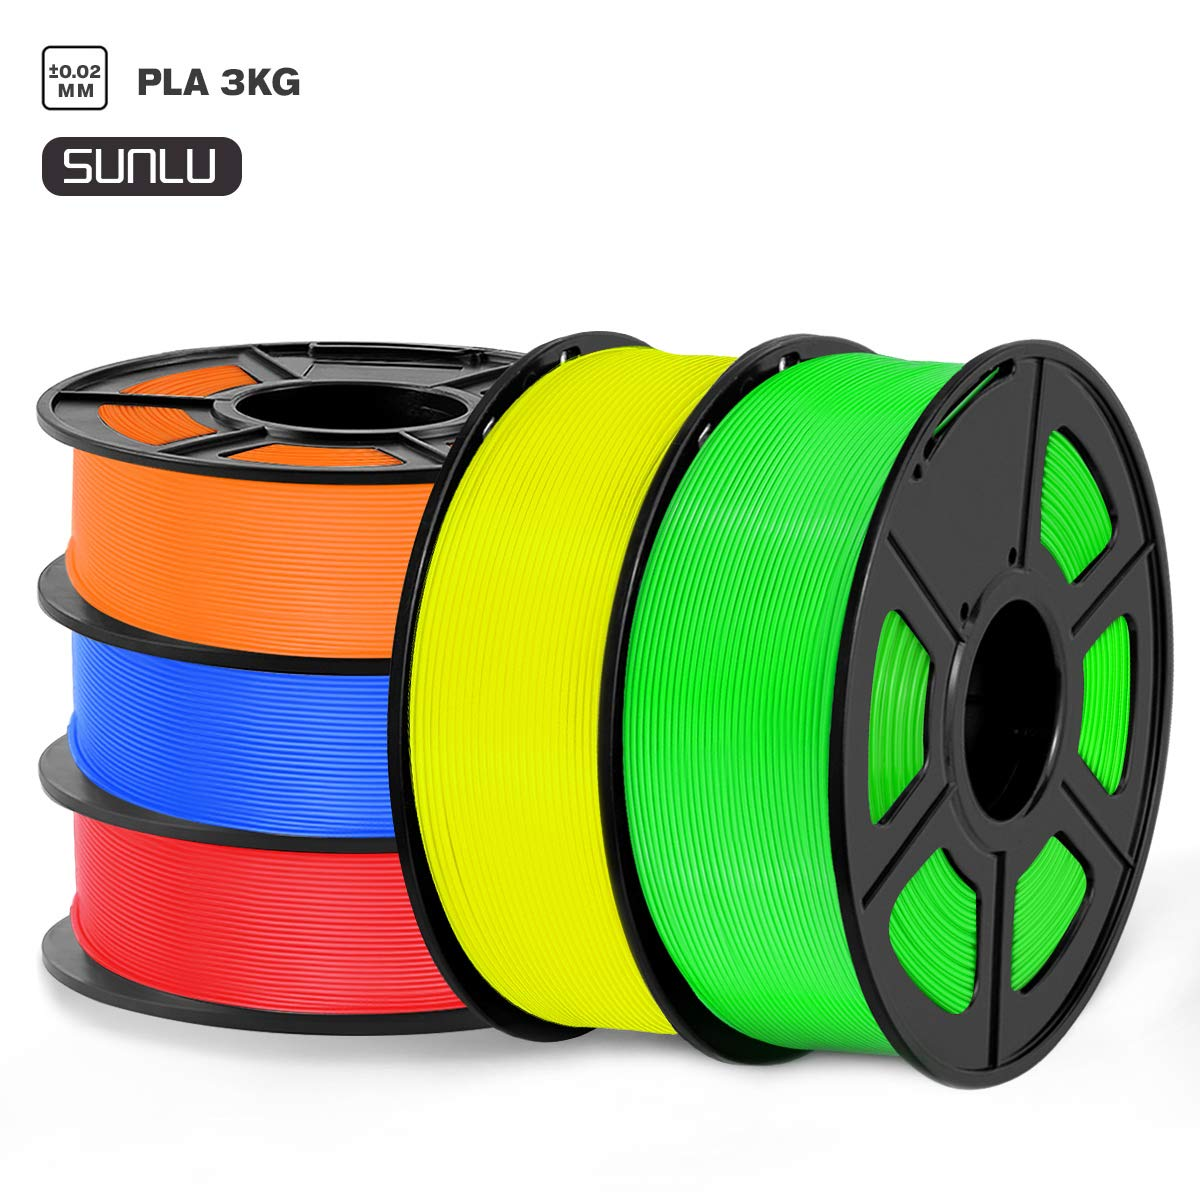 SUNLU Filamento PLA 1.75mm 5kg Impresora 3D Filamento, Precisión Dimensional +/- 0.02 mm, PLA Azul,Rojo,Amarillo, Verde + Naranja